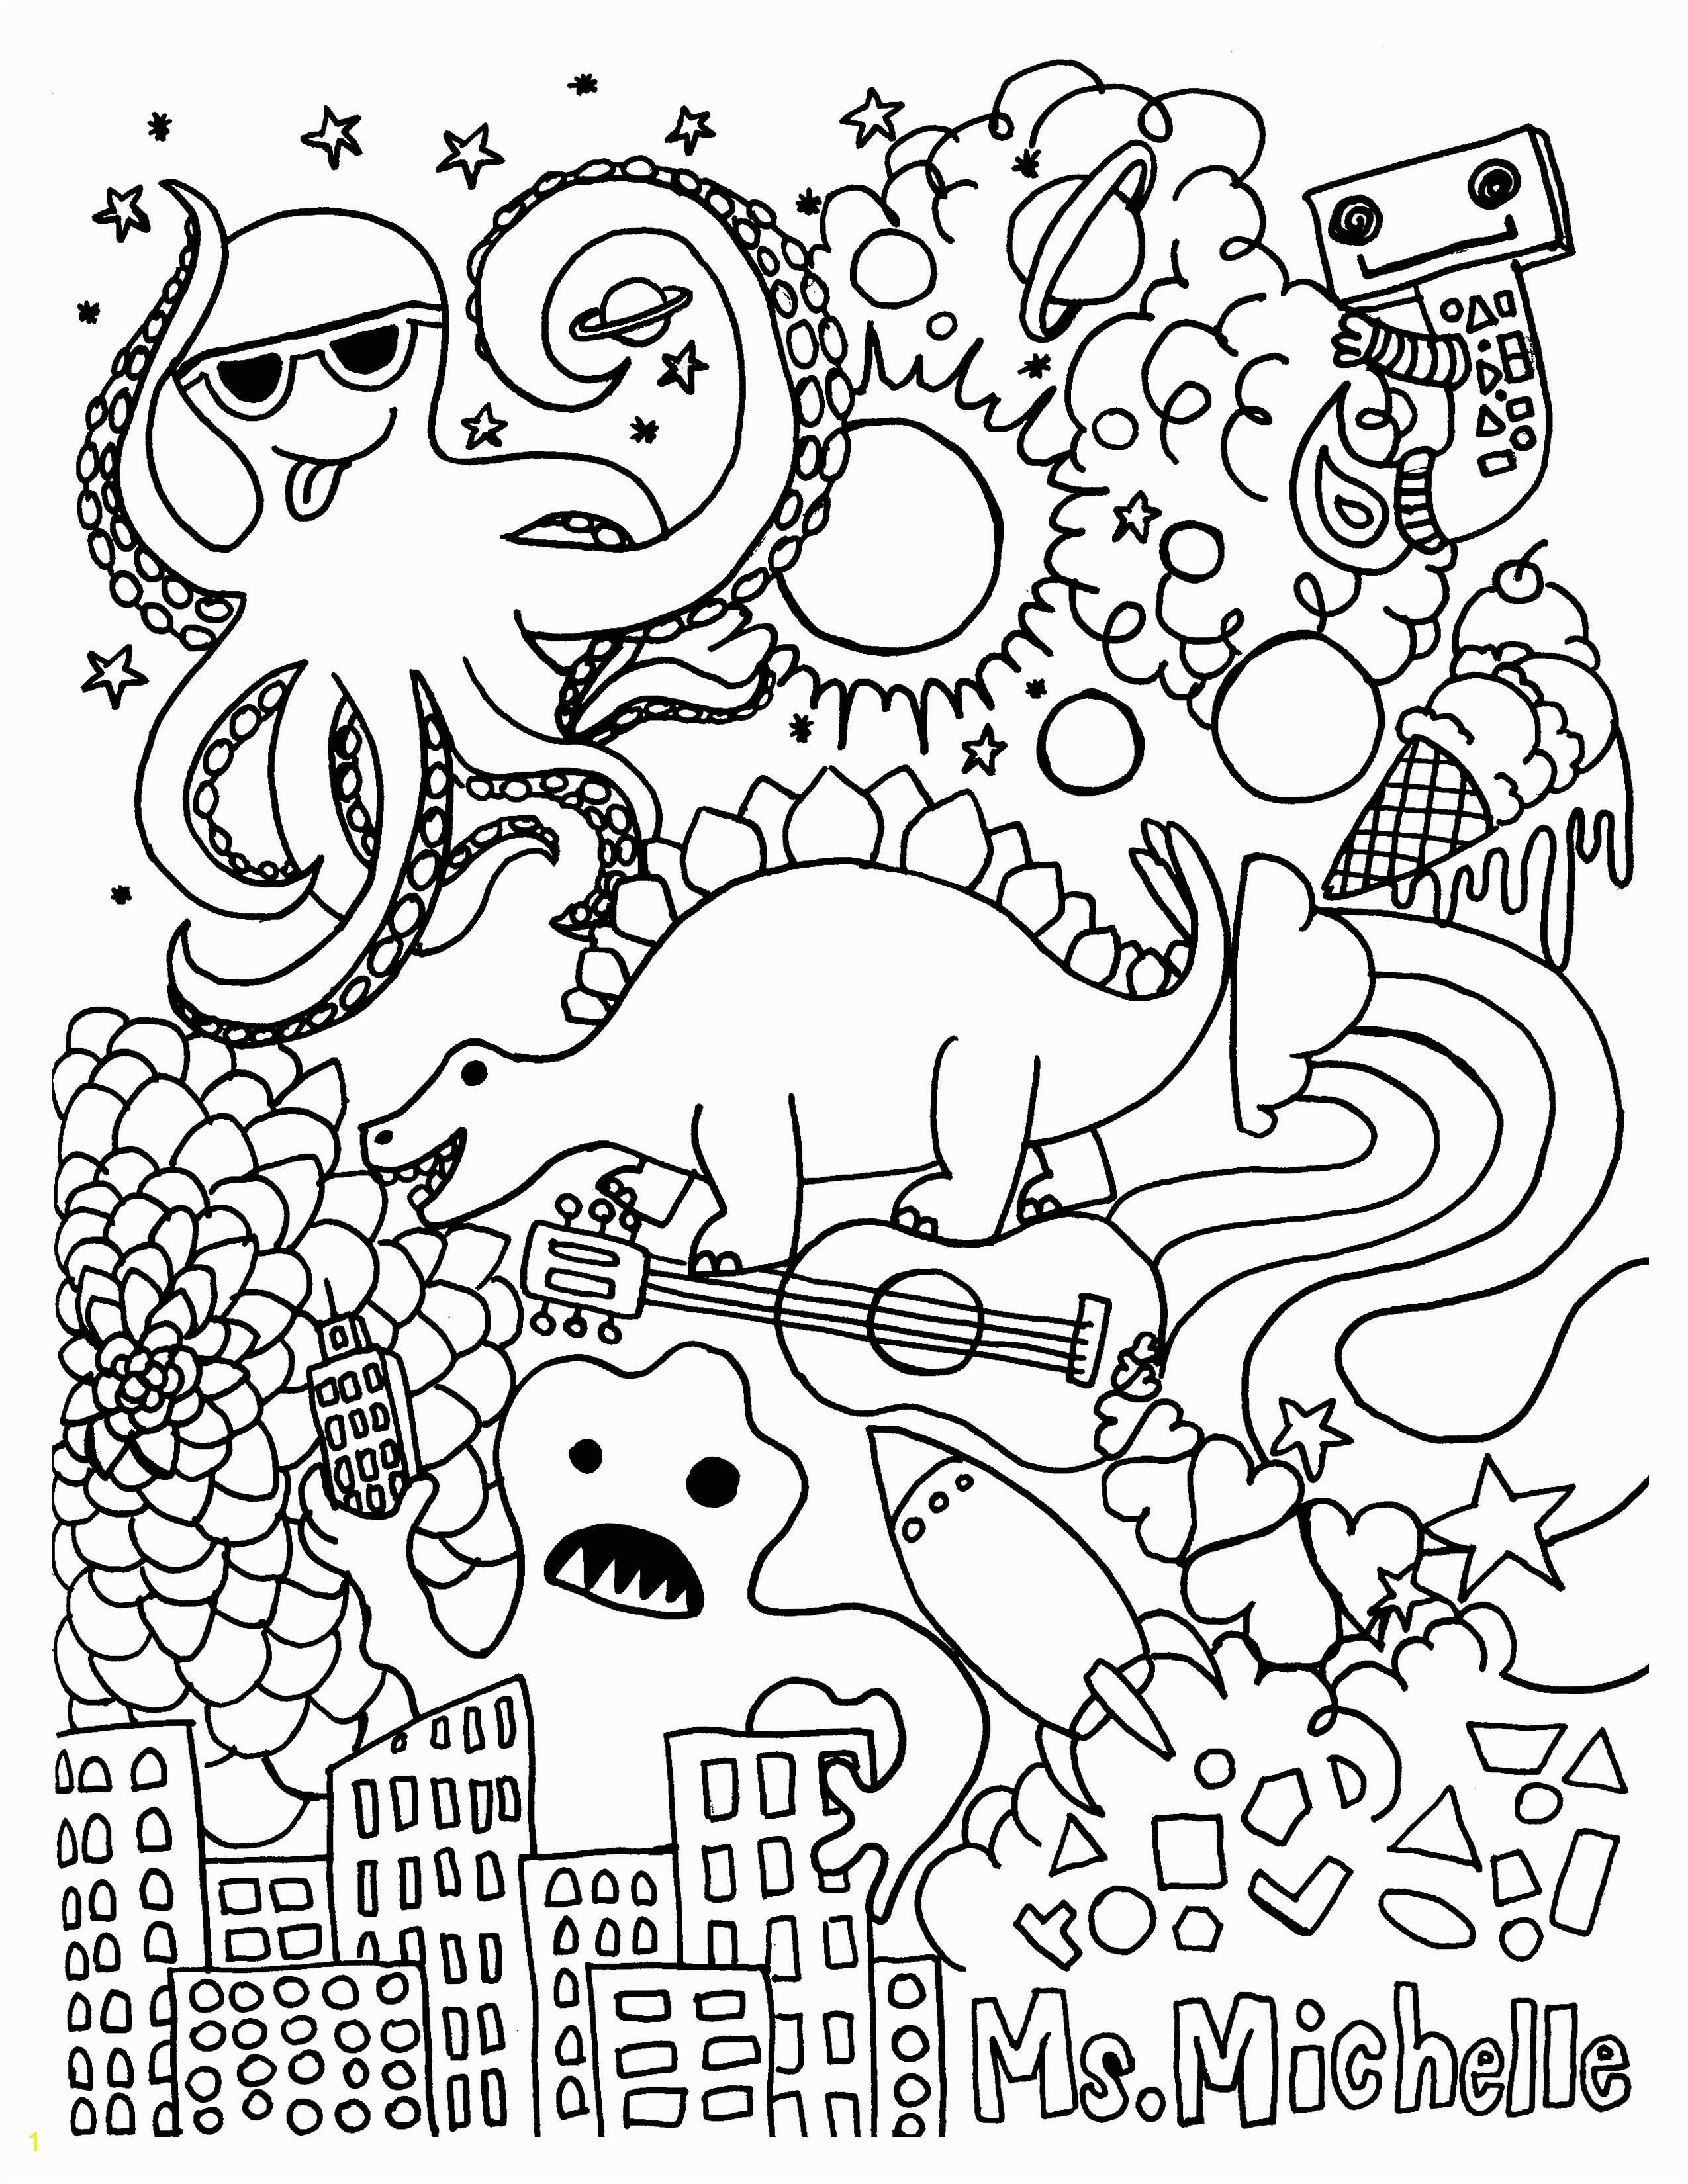 Printable Printable Coloring Pages for Kids Best Ariel Little Mermaid